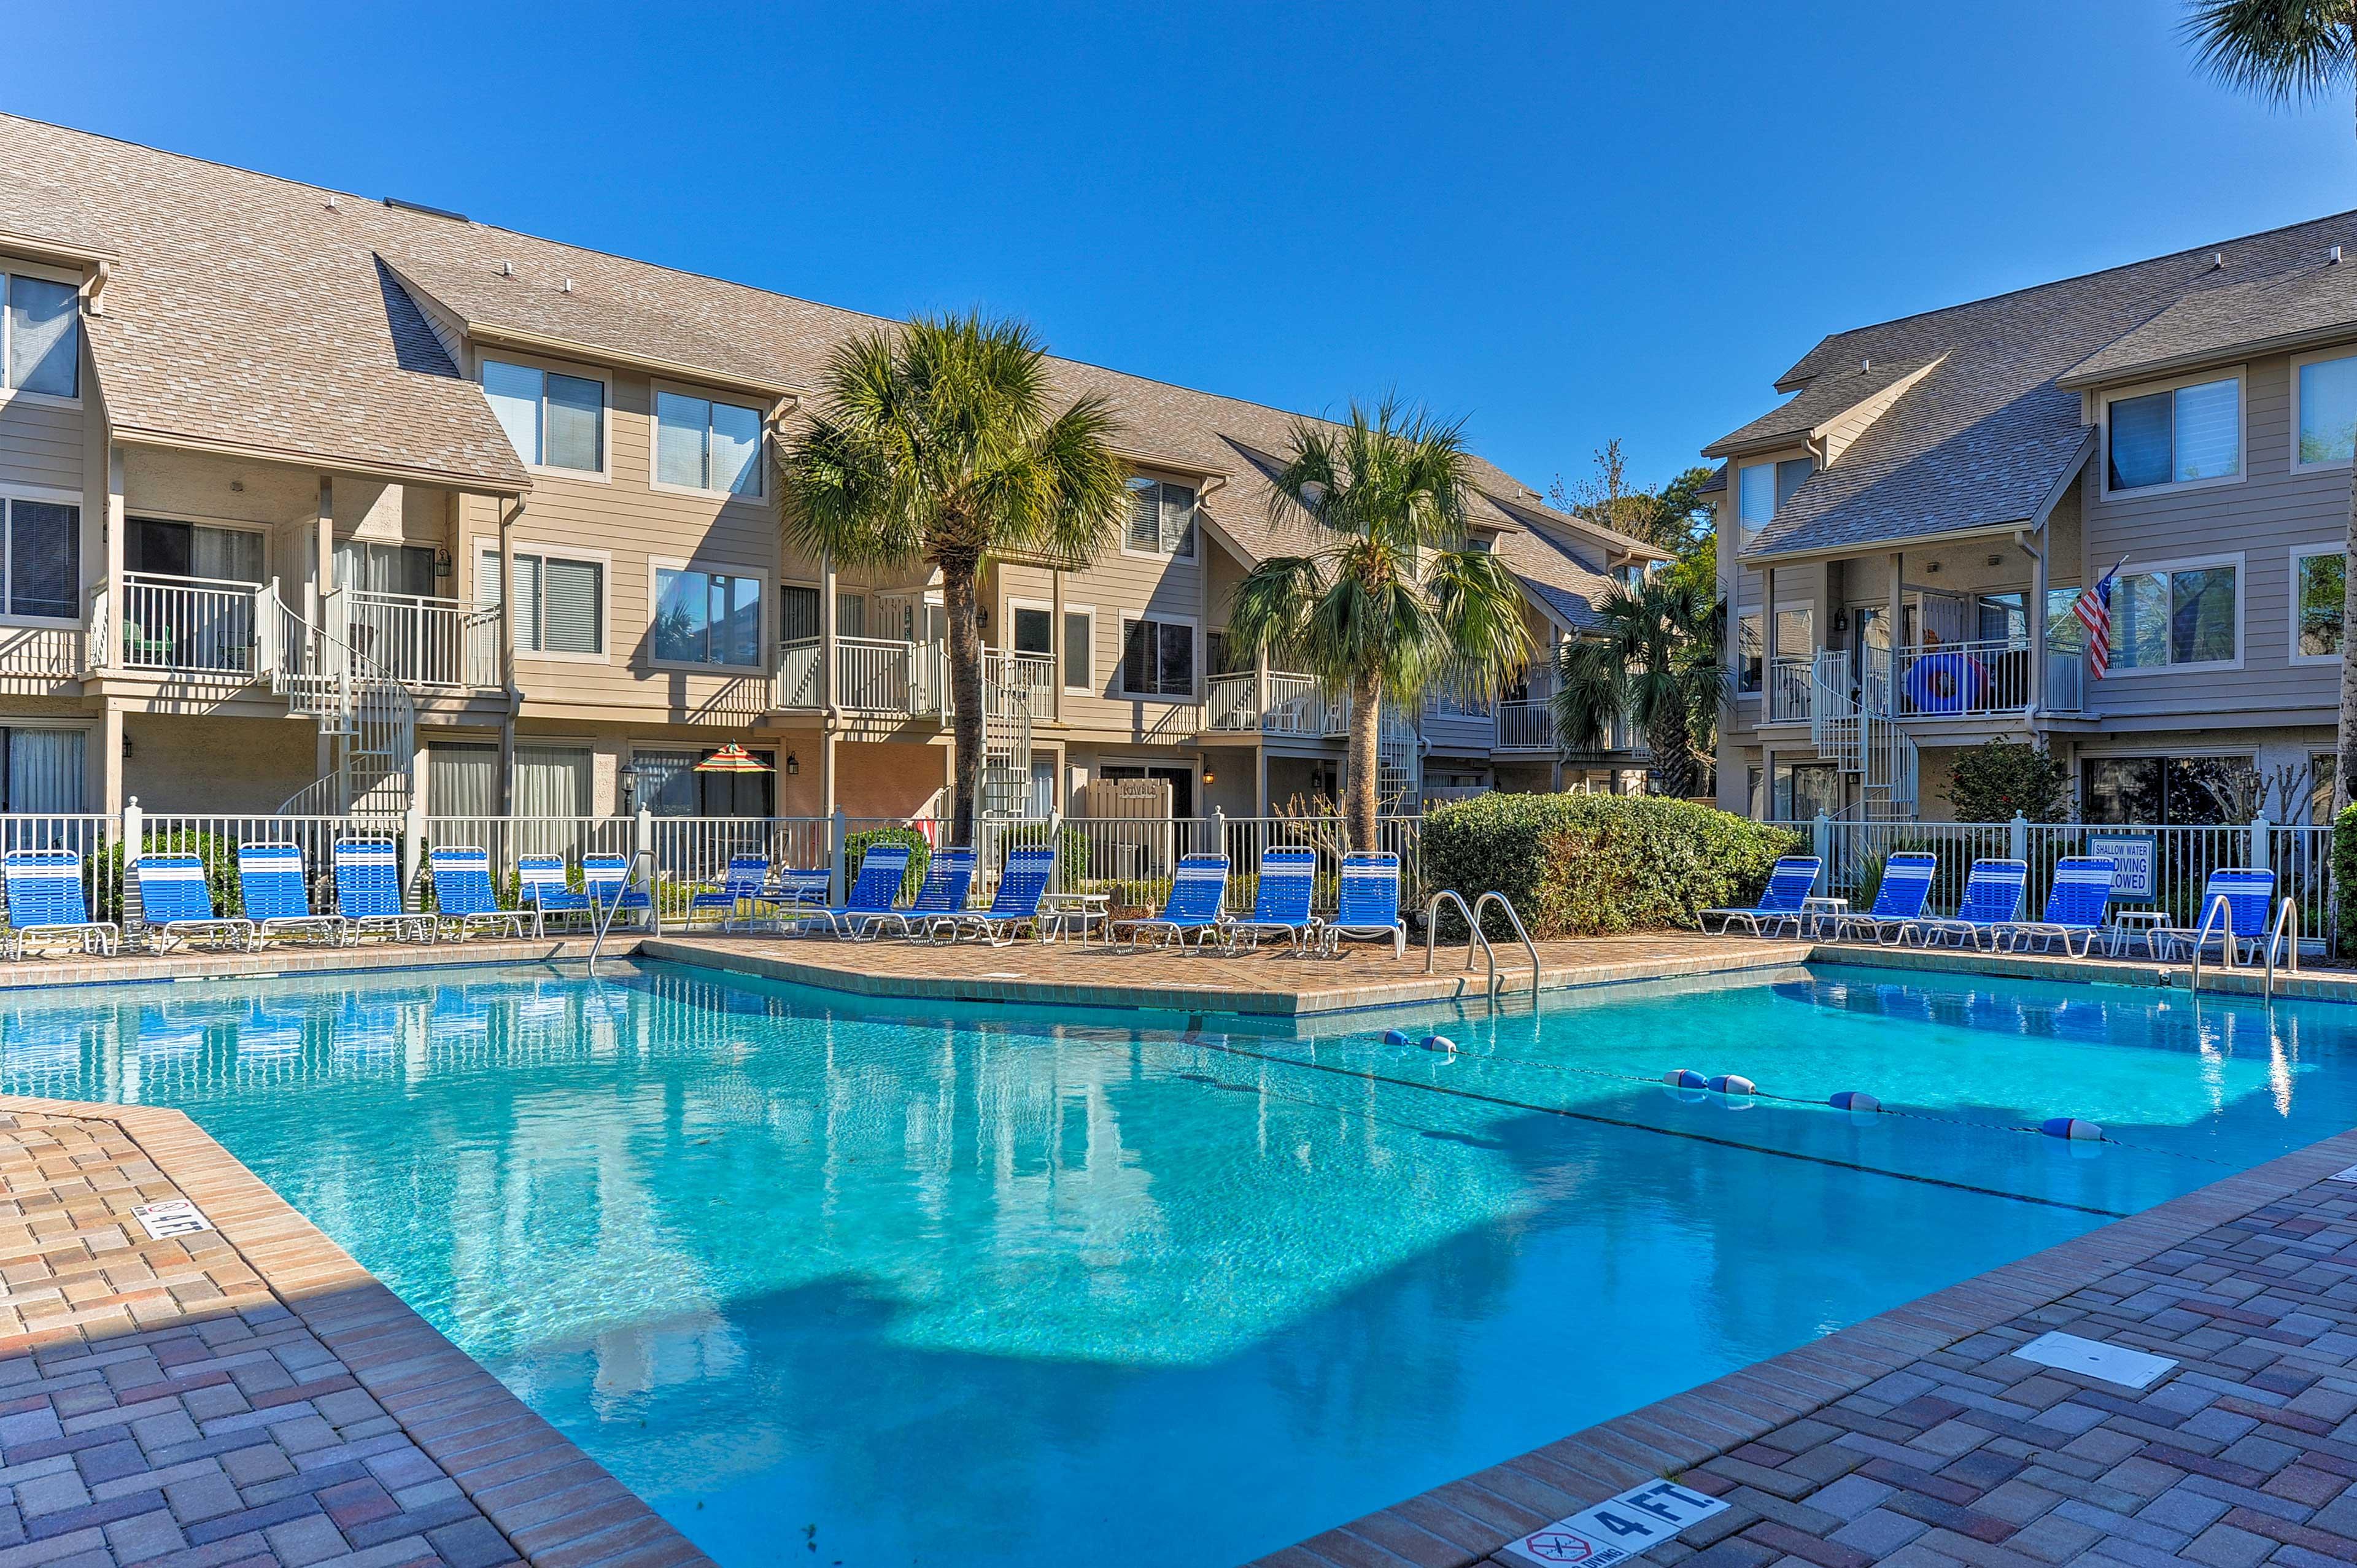 Hilton Head Vacation Rental   2BR   2BA   2 Stories   1,300 Sq Ft